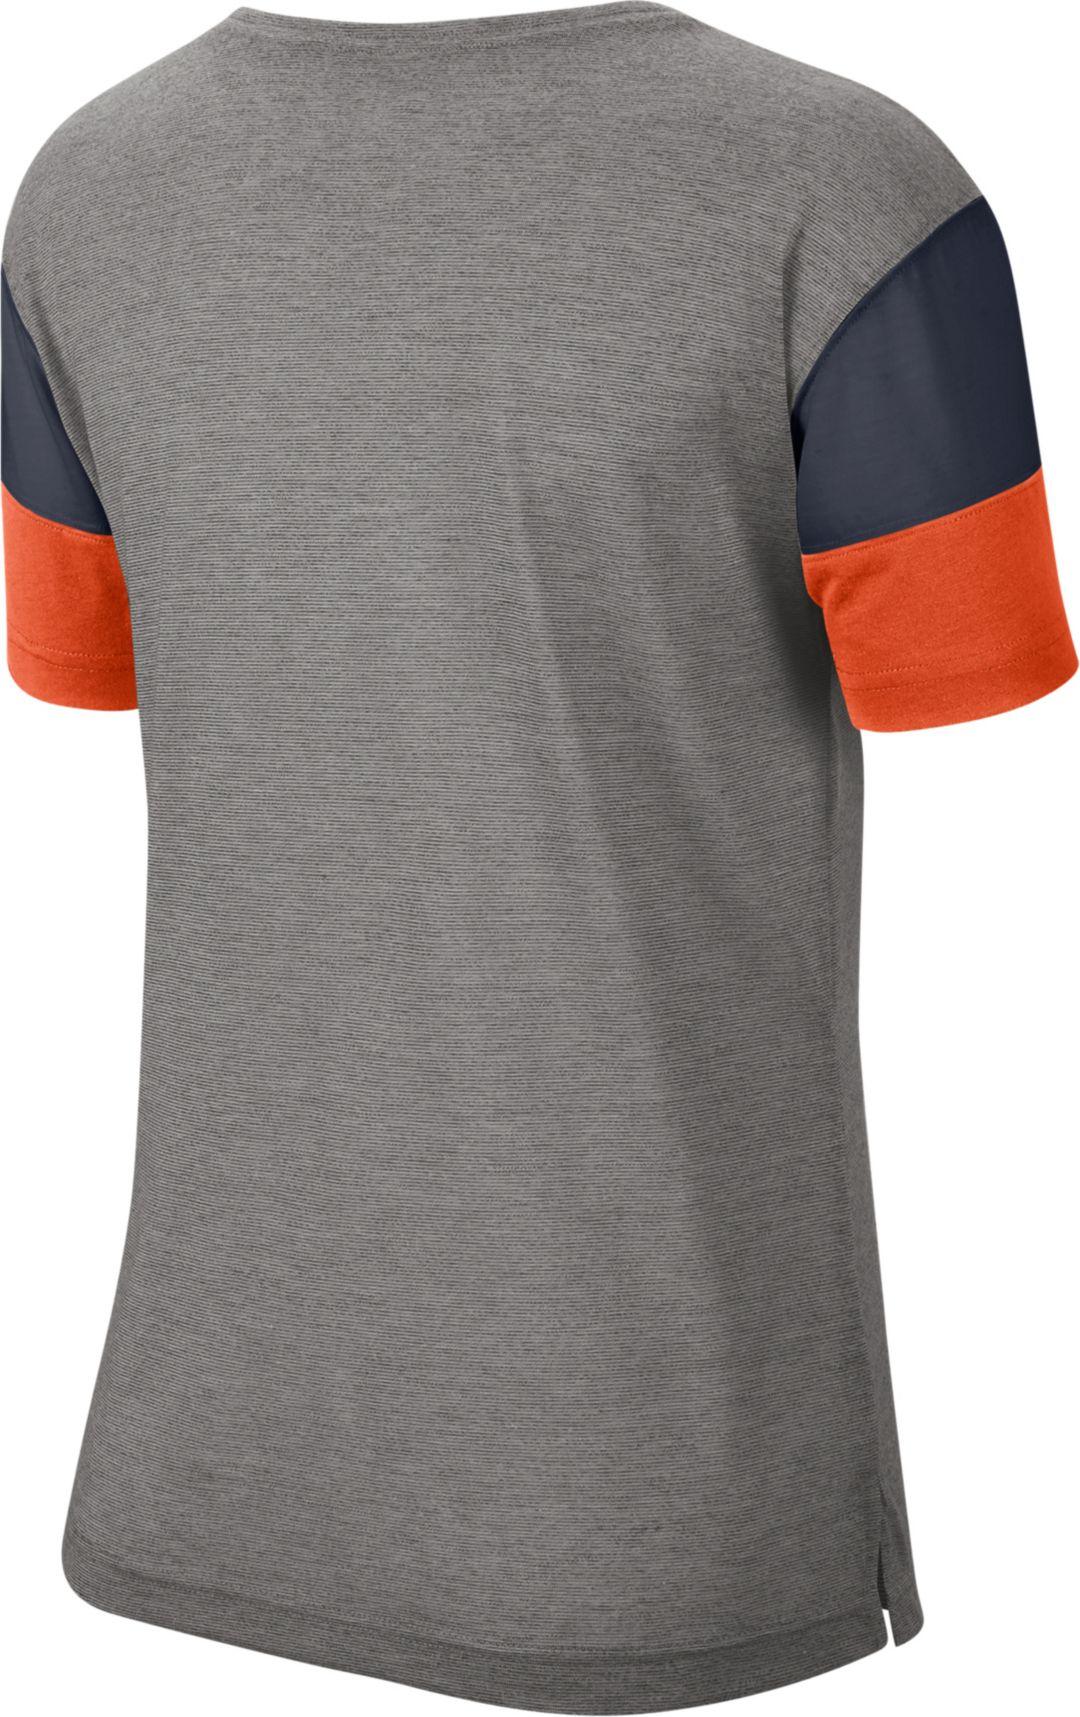 new style 92f17 a395f Nike Women's Chicago Bears Breathe Heather Grey V-Neck T-Shirt